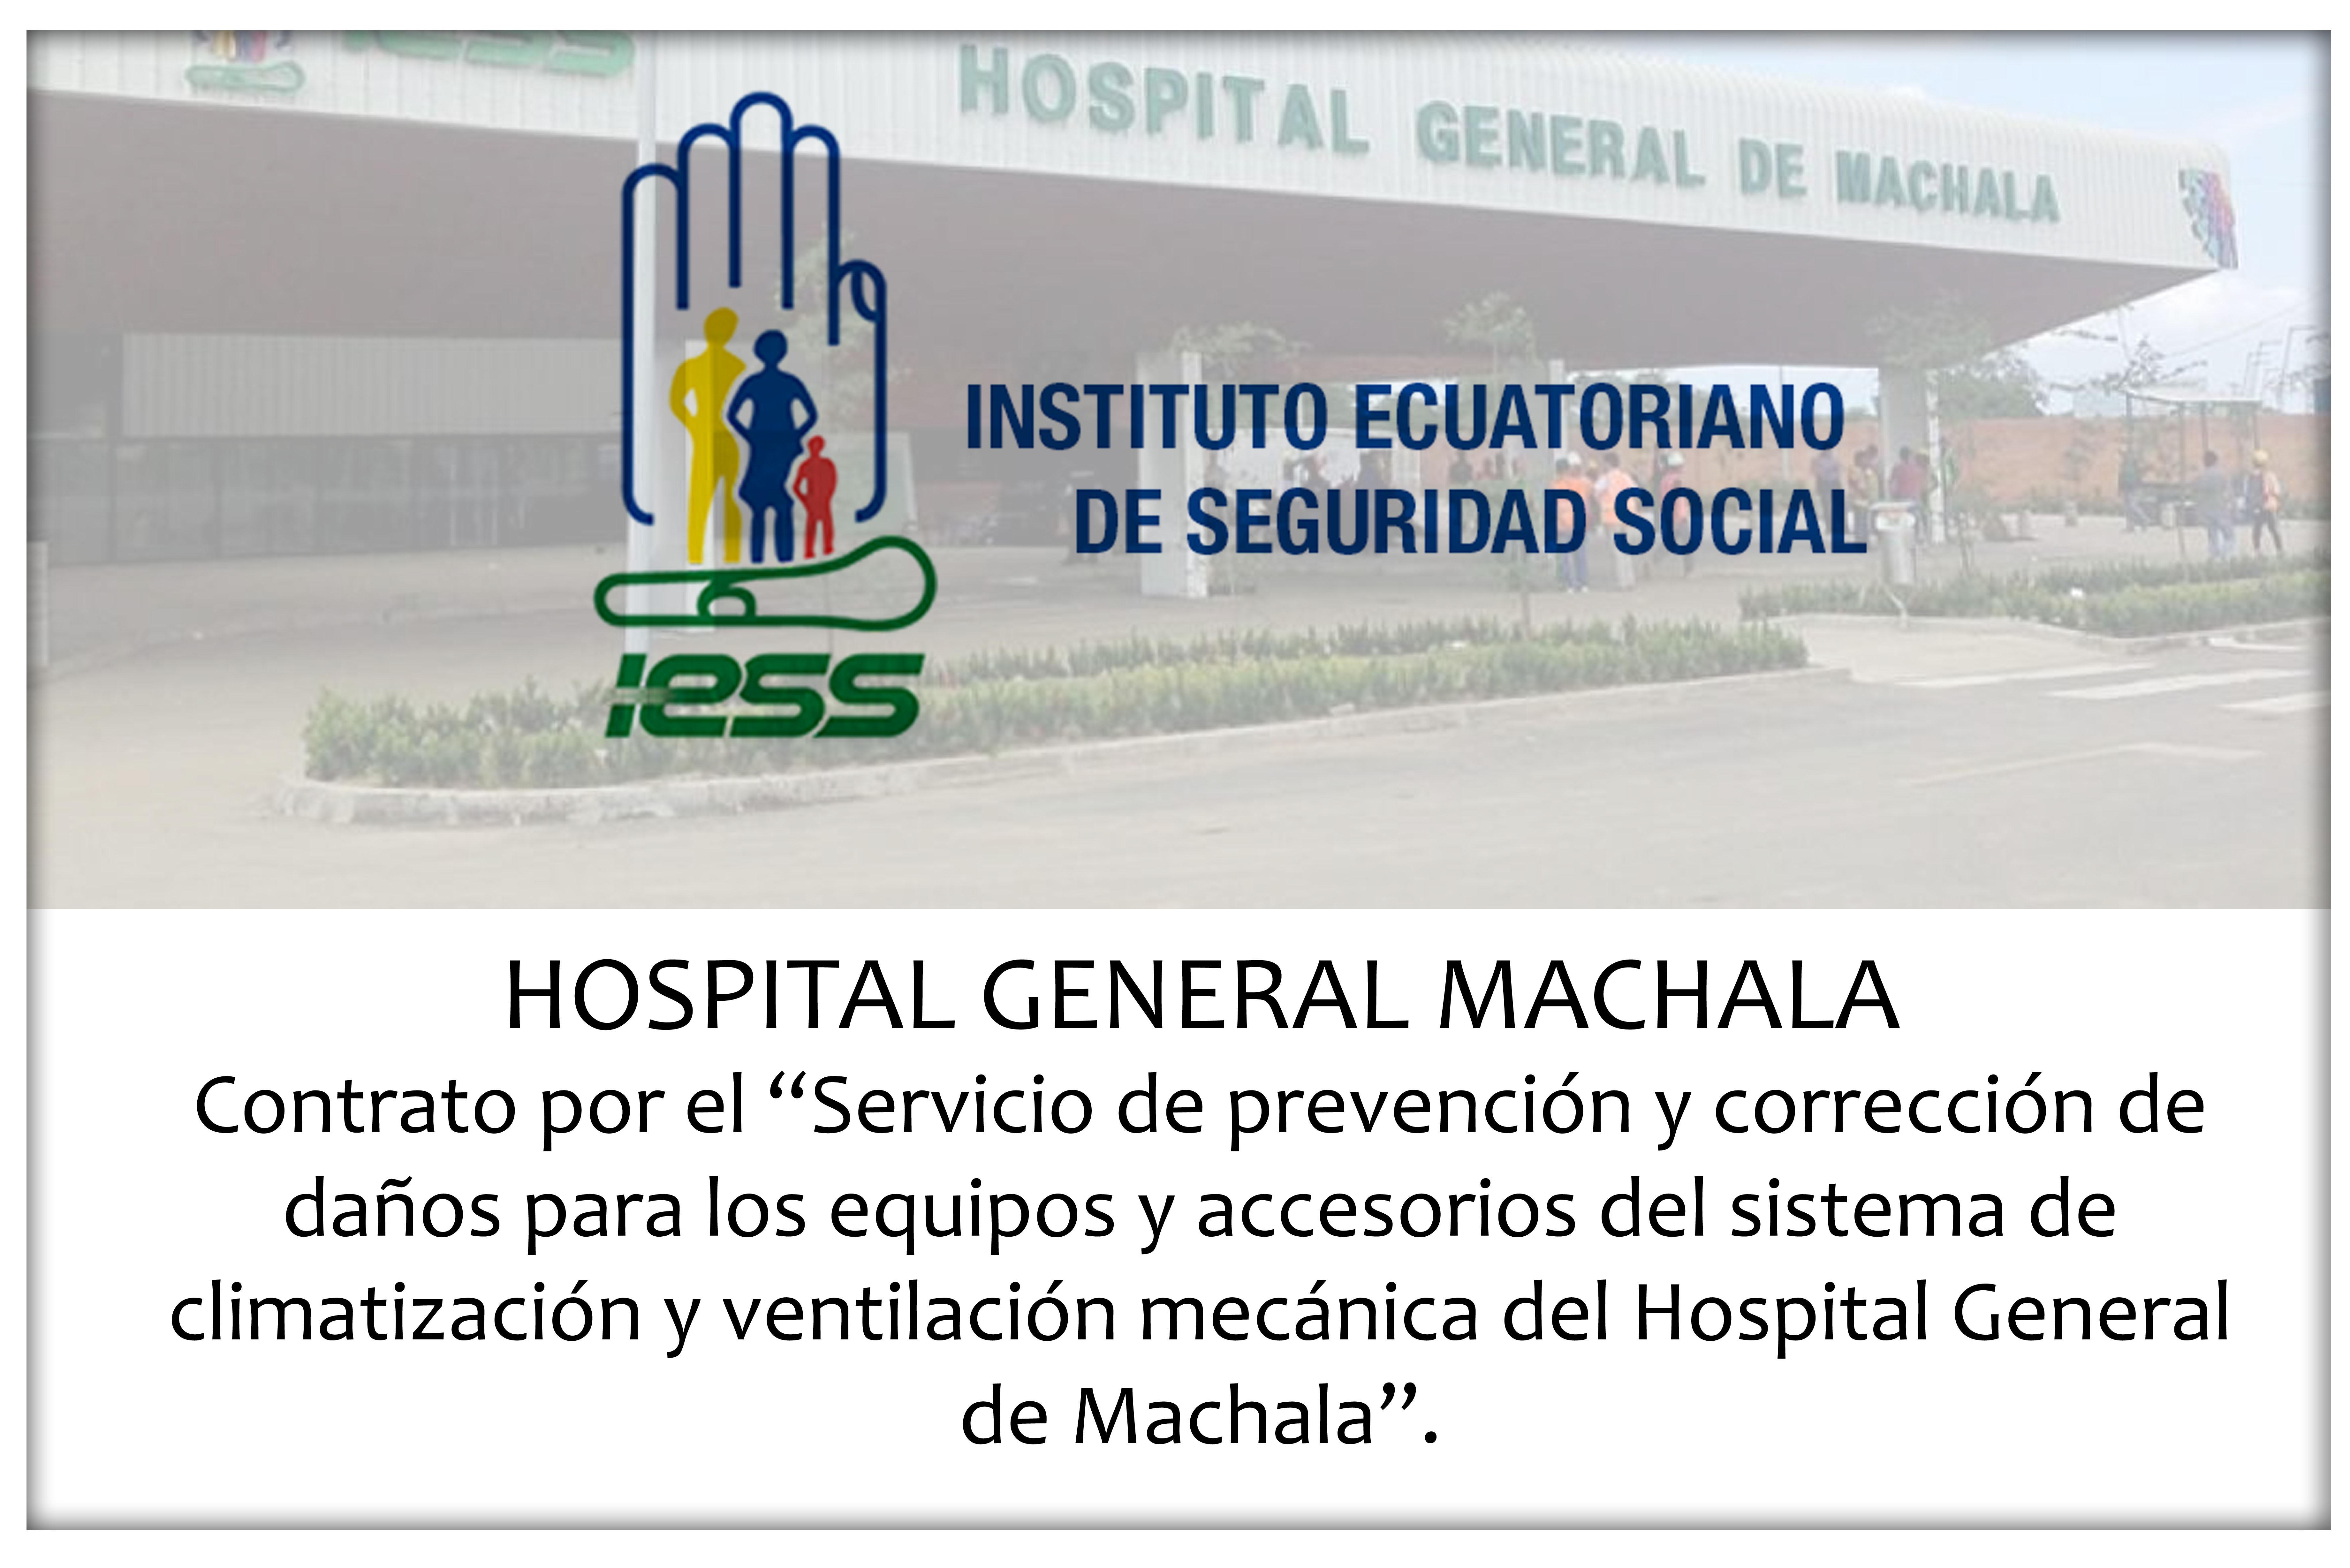 HOSPITAL DE MACHALA